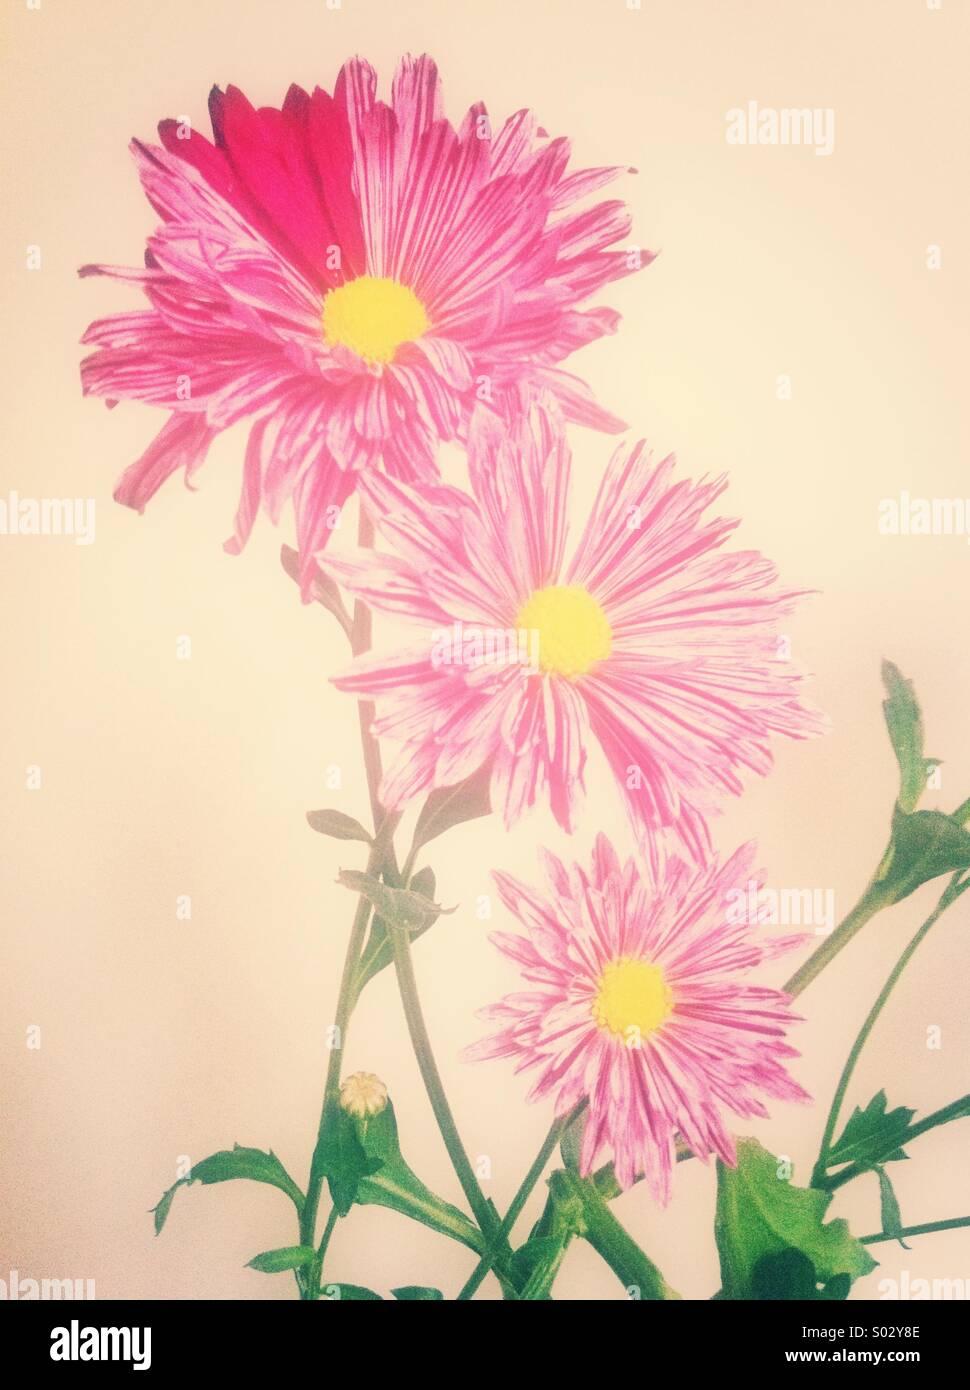 Pink chrysanthemum flowers - Stock Image